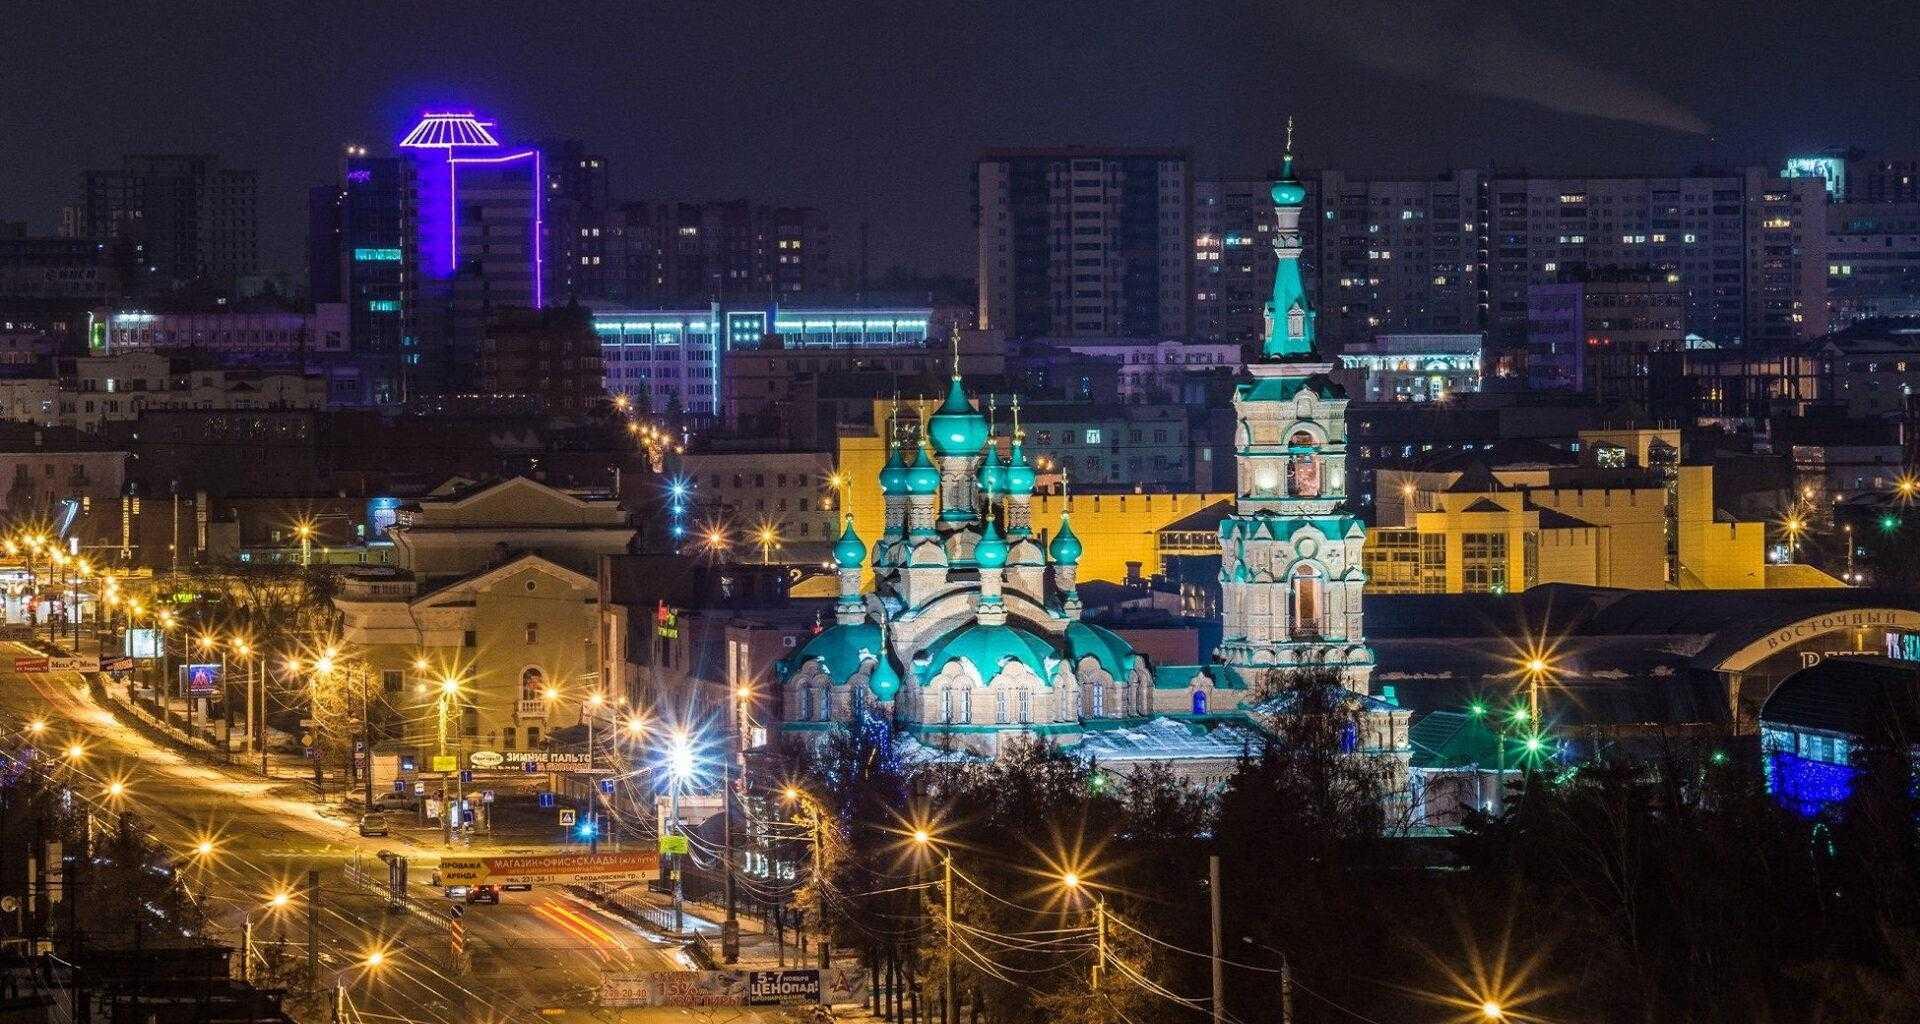 Фото вид на церковь в Челябинске